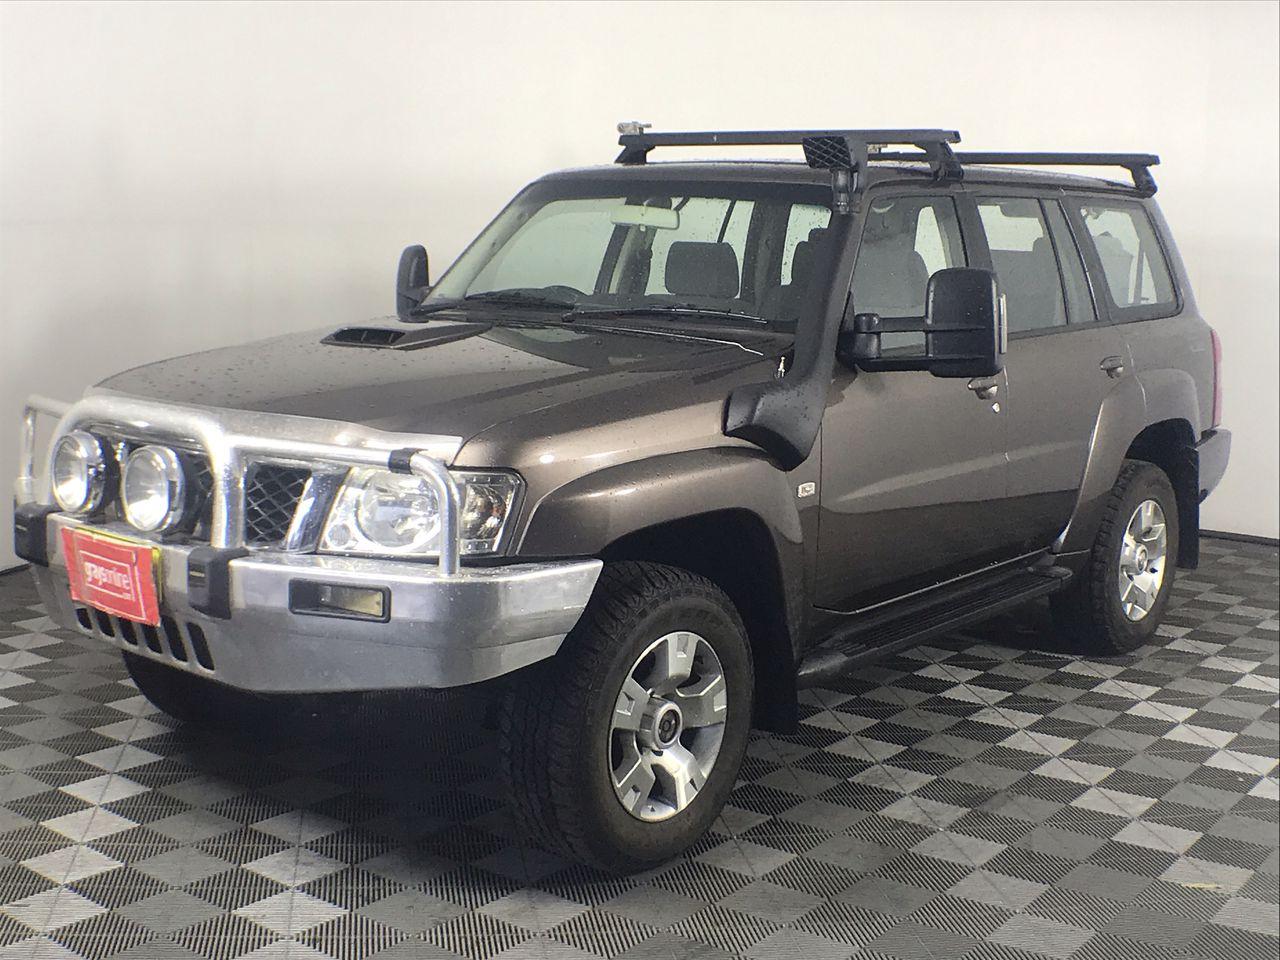 2011 Nissan Patrol DX (4x4) GU Turbo Diesel Auto 7 Seats Wagon